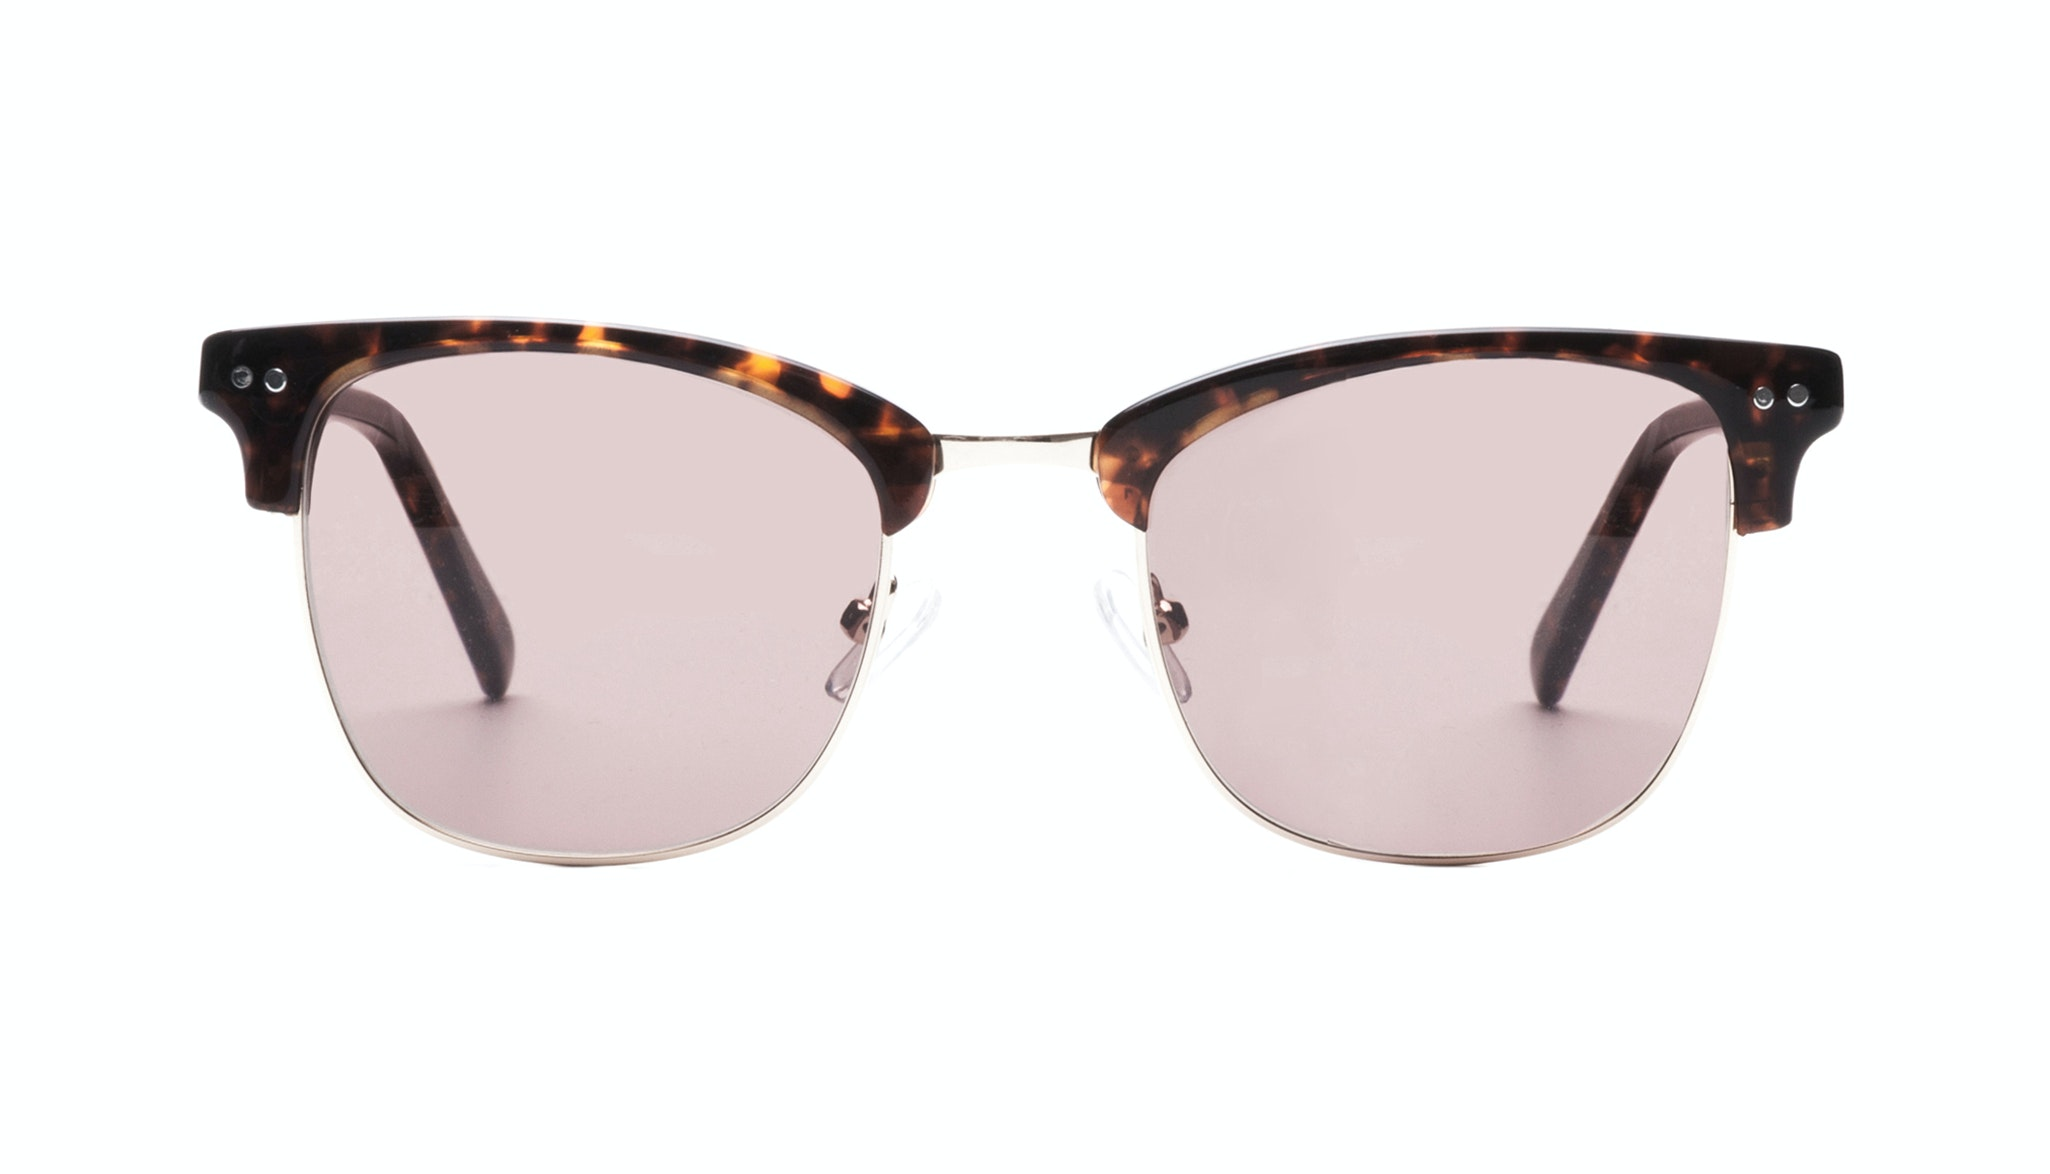 Affordable Fashion Glasses Square Sunglasses Men Lift Gold Sepia Front